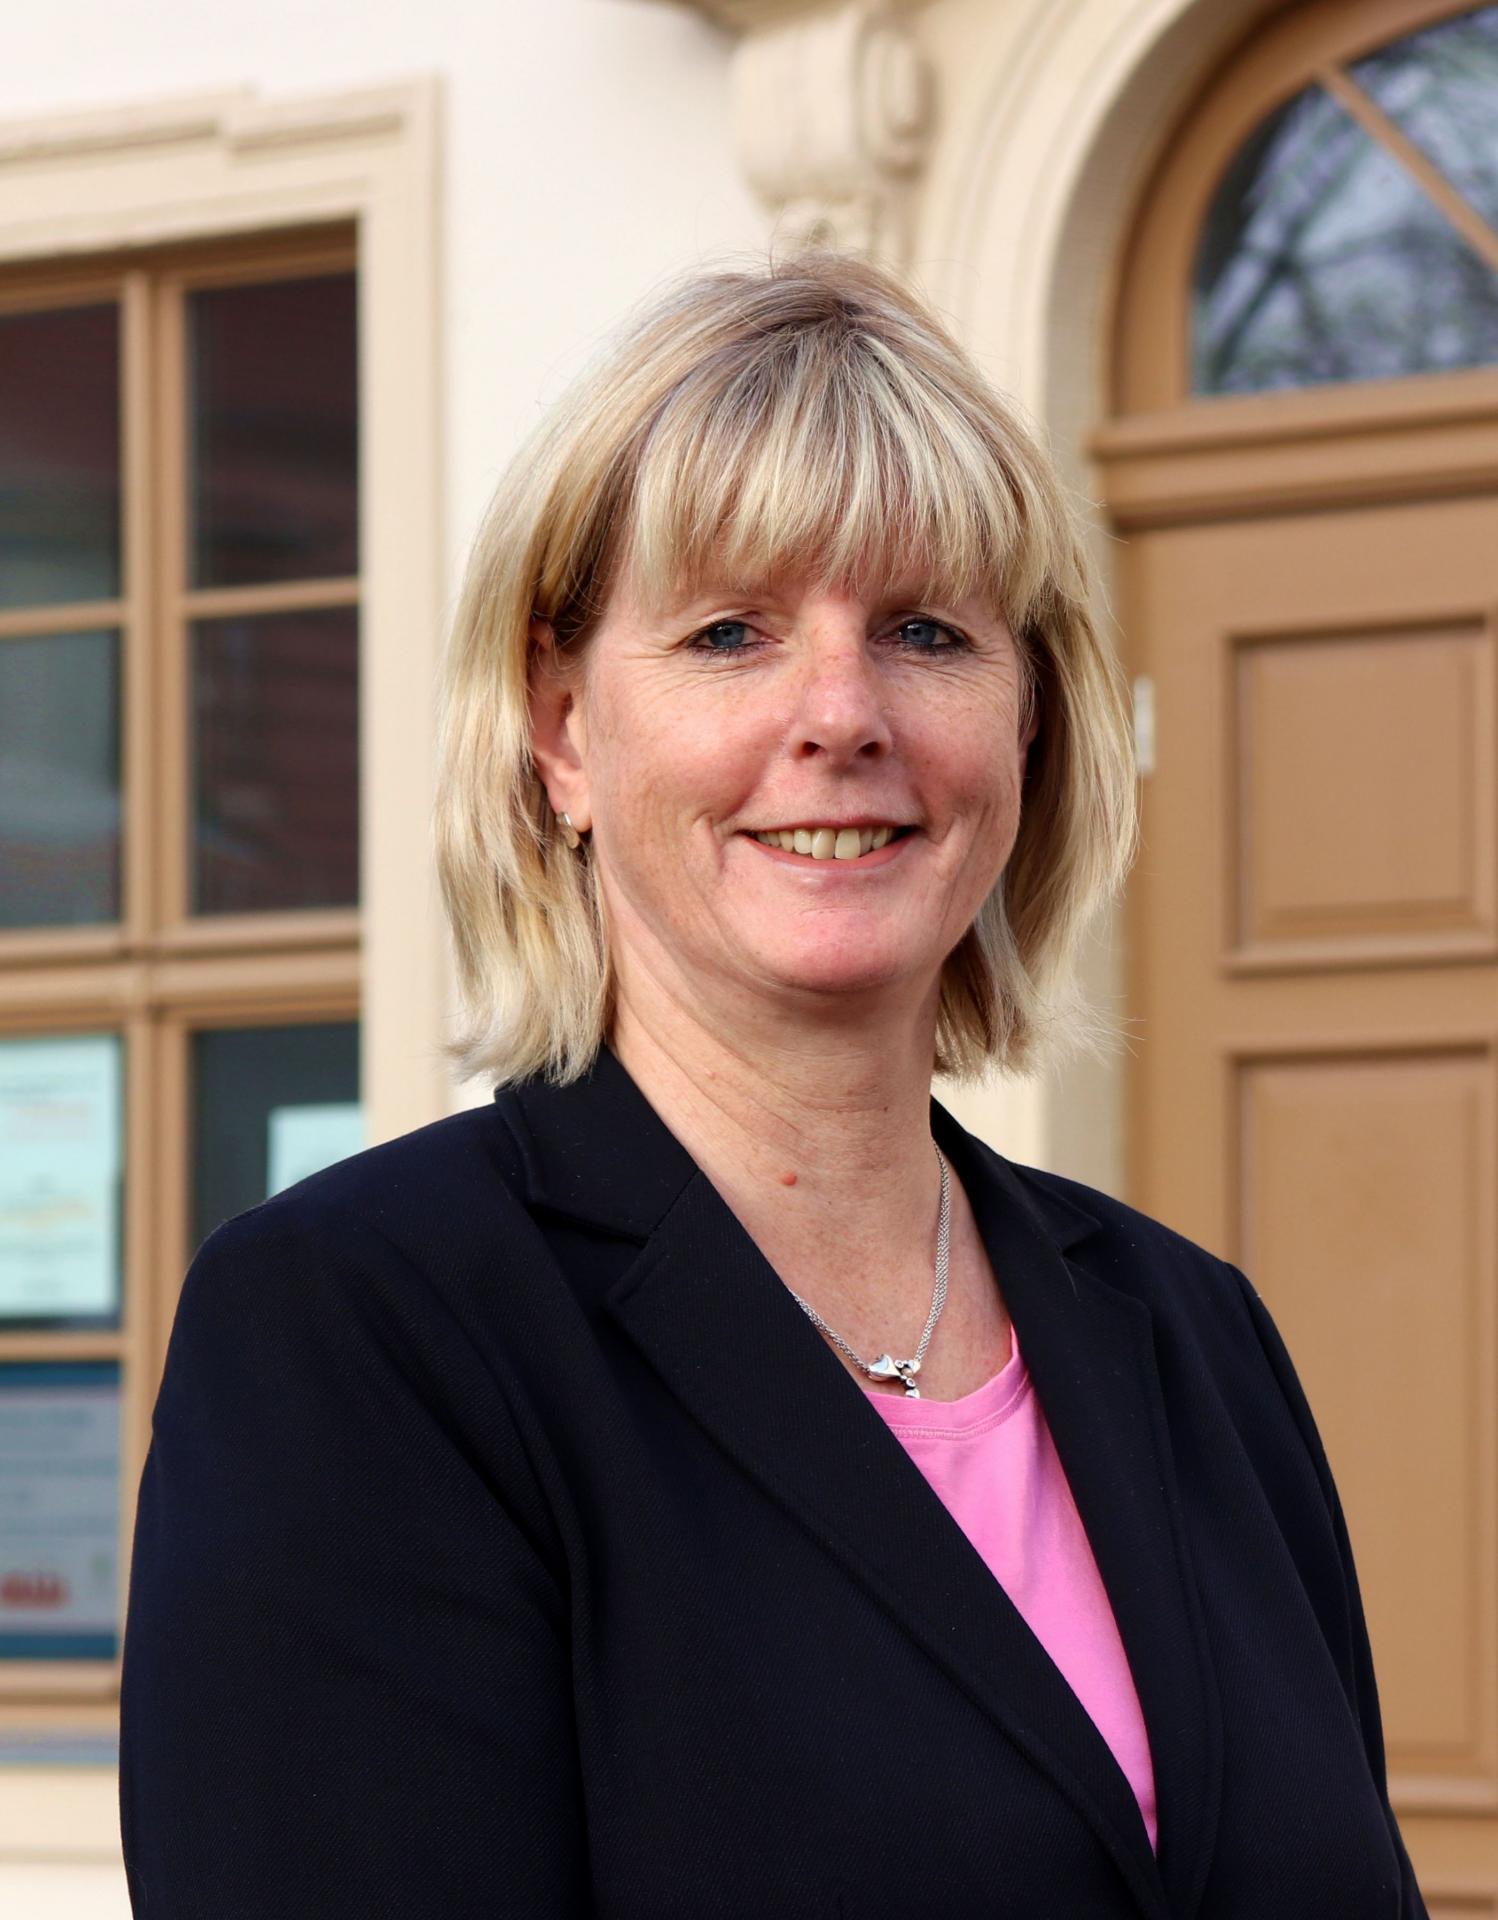 Bürgermeisterin Steffi Friedebold